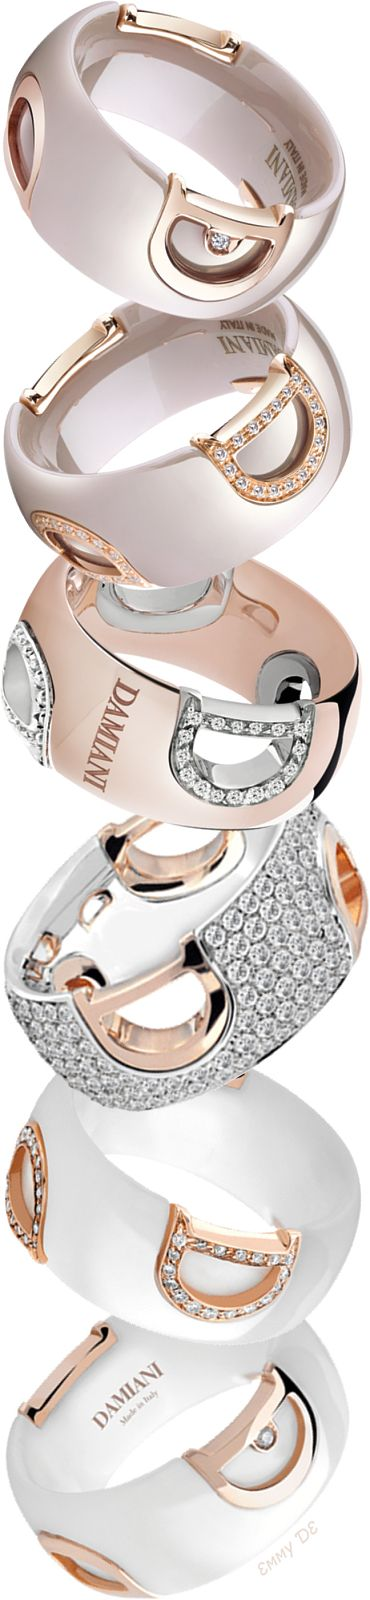 Brilliant Luxury by Emmy DE * Damiani 'Icon' Rings/Dorothy Johnson